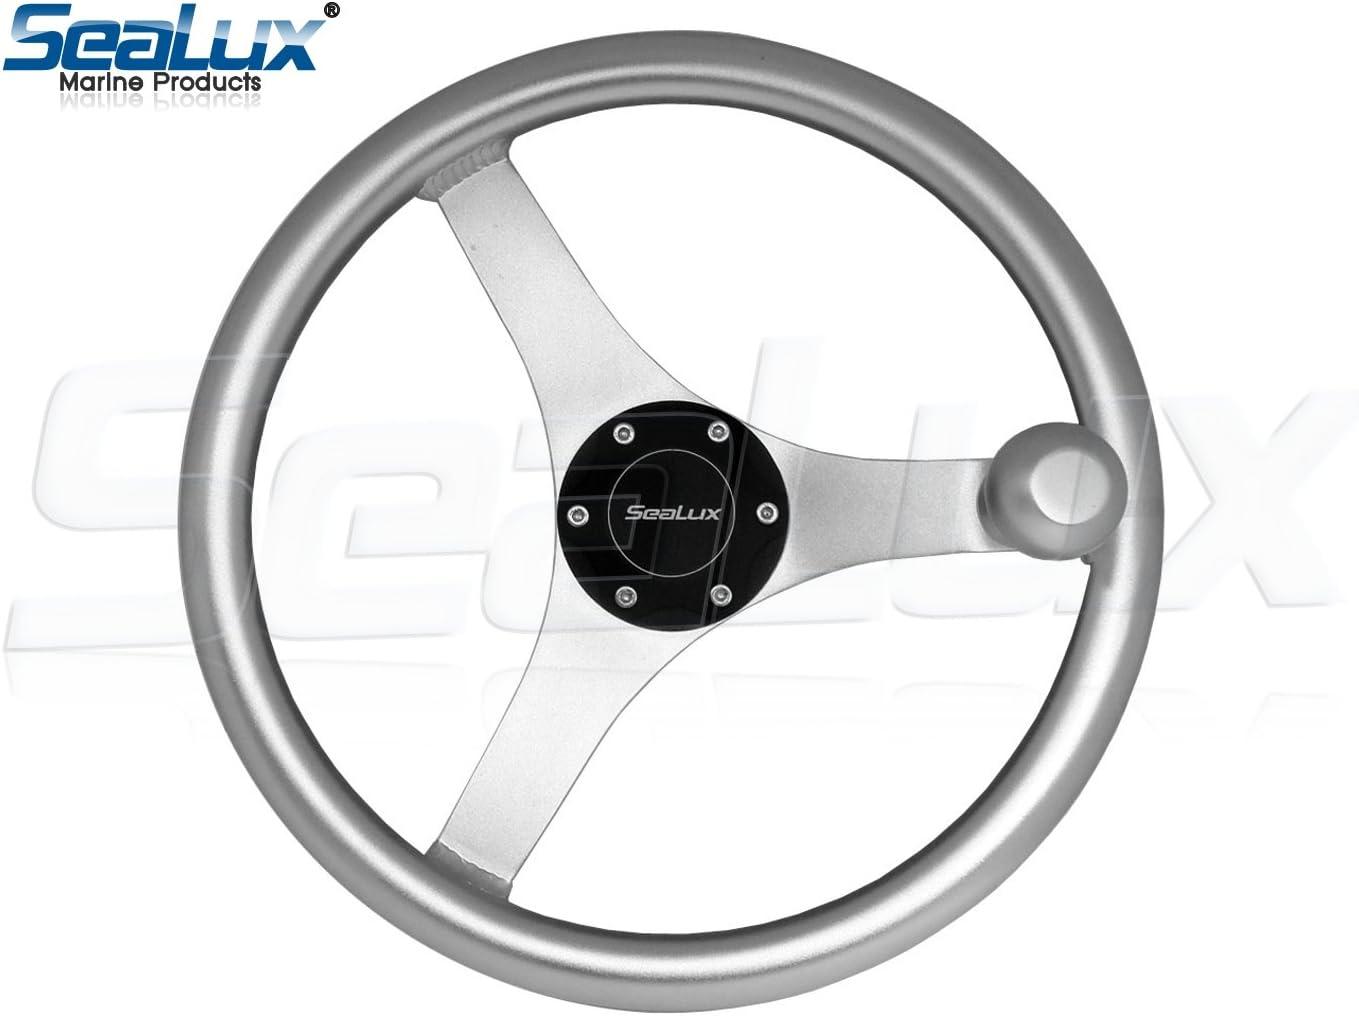 MARINE CITY 13-1//2 Marine Grade Aluminum Fabricated Sports Steering Wheel with Aluminum Knob